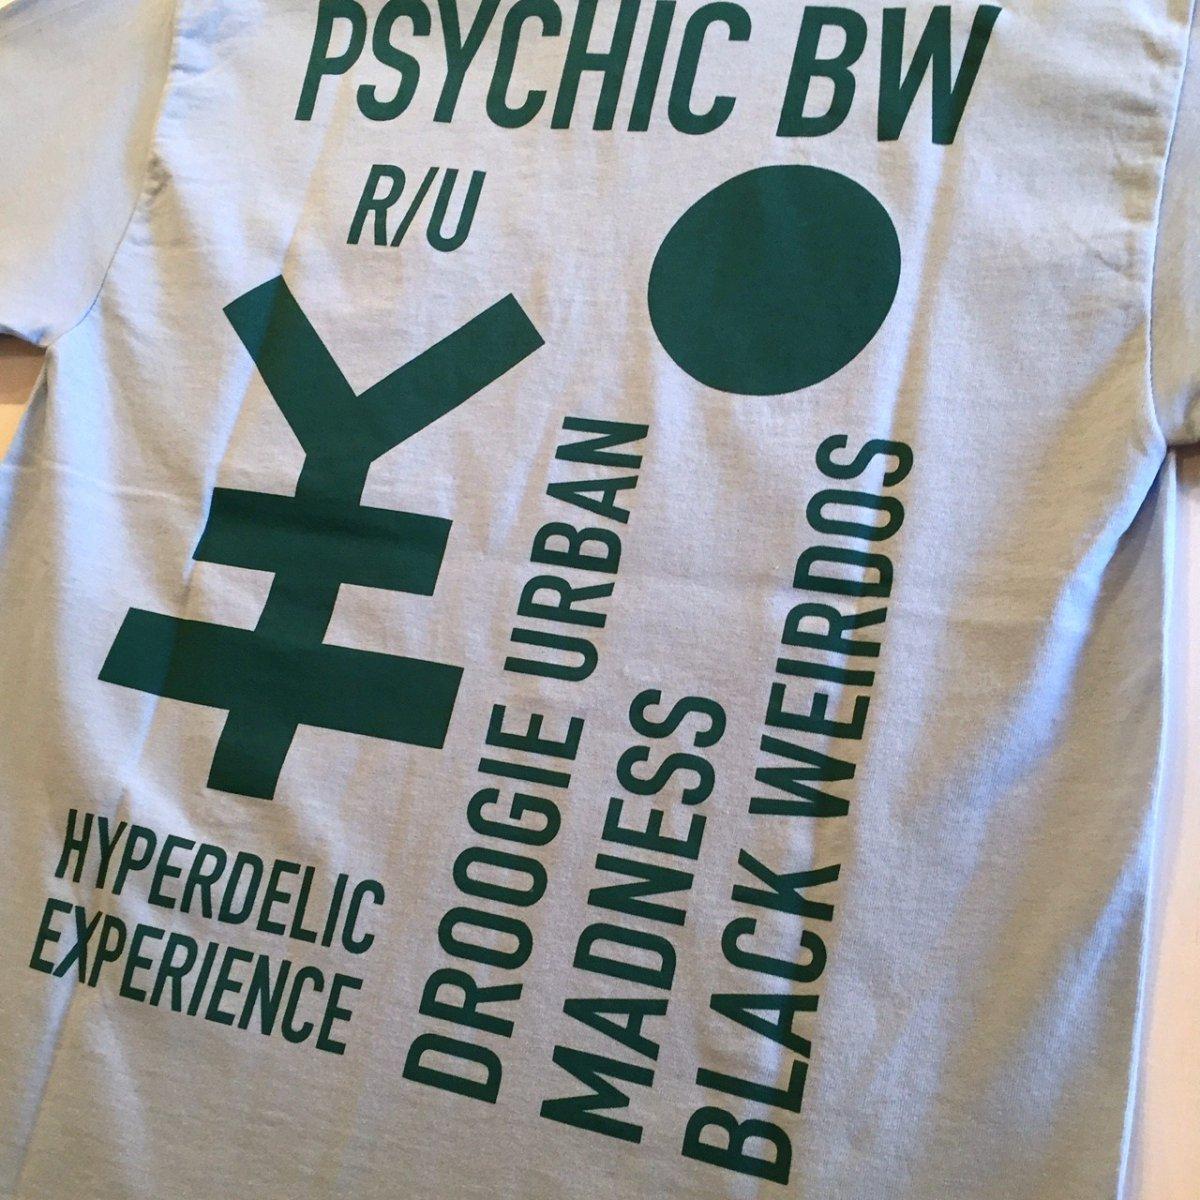 <img class='new_mark_img1' src='https://img.shop-pro.jp/img/new/icons3.gif' style='border:none;display:inline;margin:0px;padding:0px;width:auto;' />Black Weirdos  ブラック ウィドー / Tシャツ PSYCHIC BW Pocket Tee 【SKY】